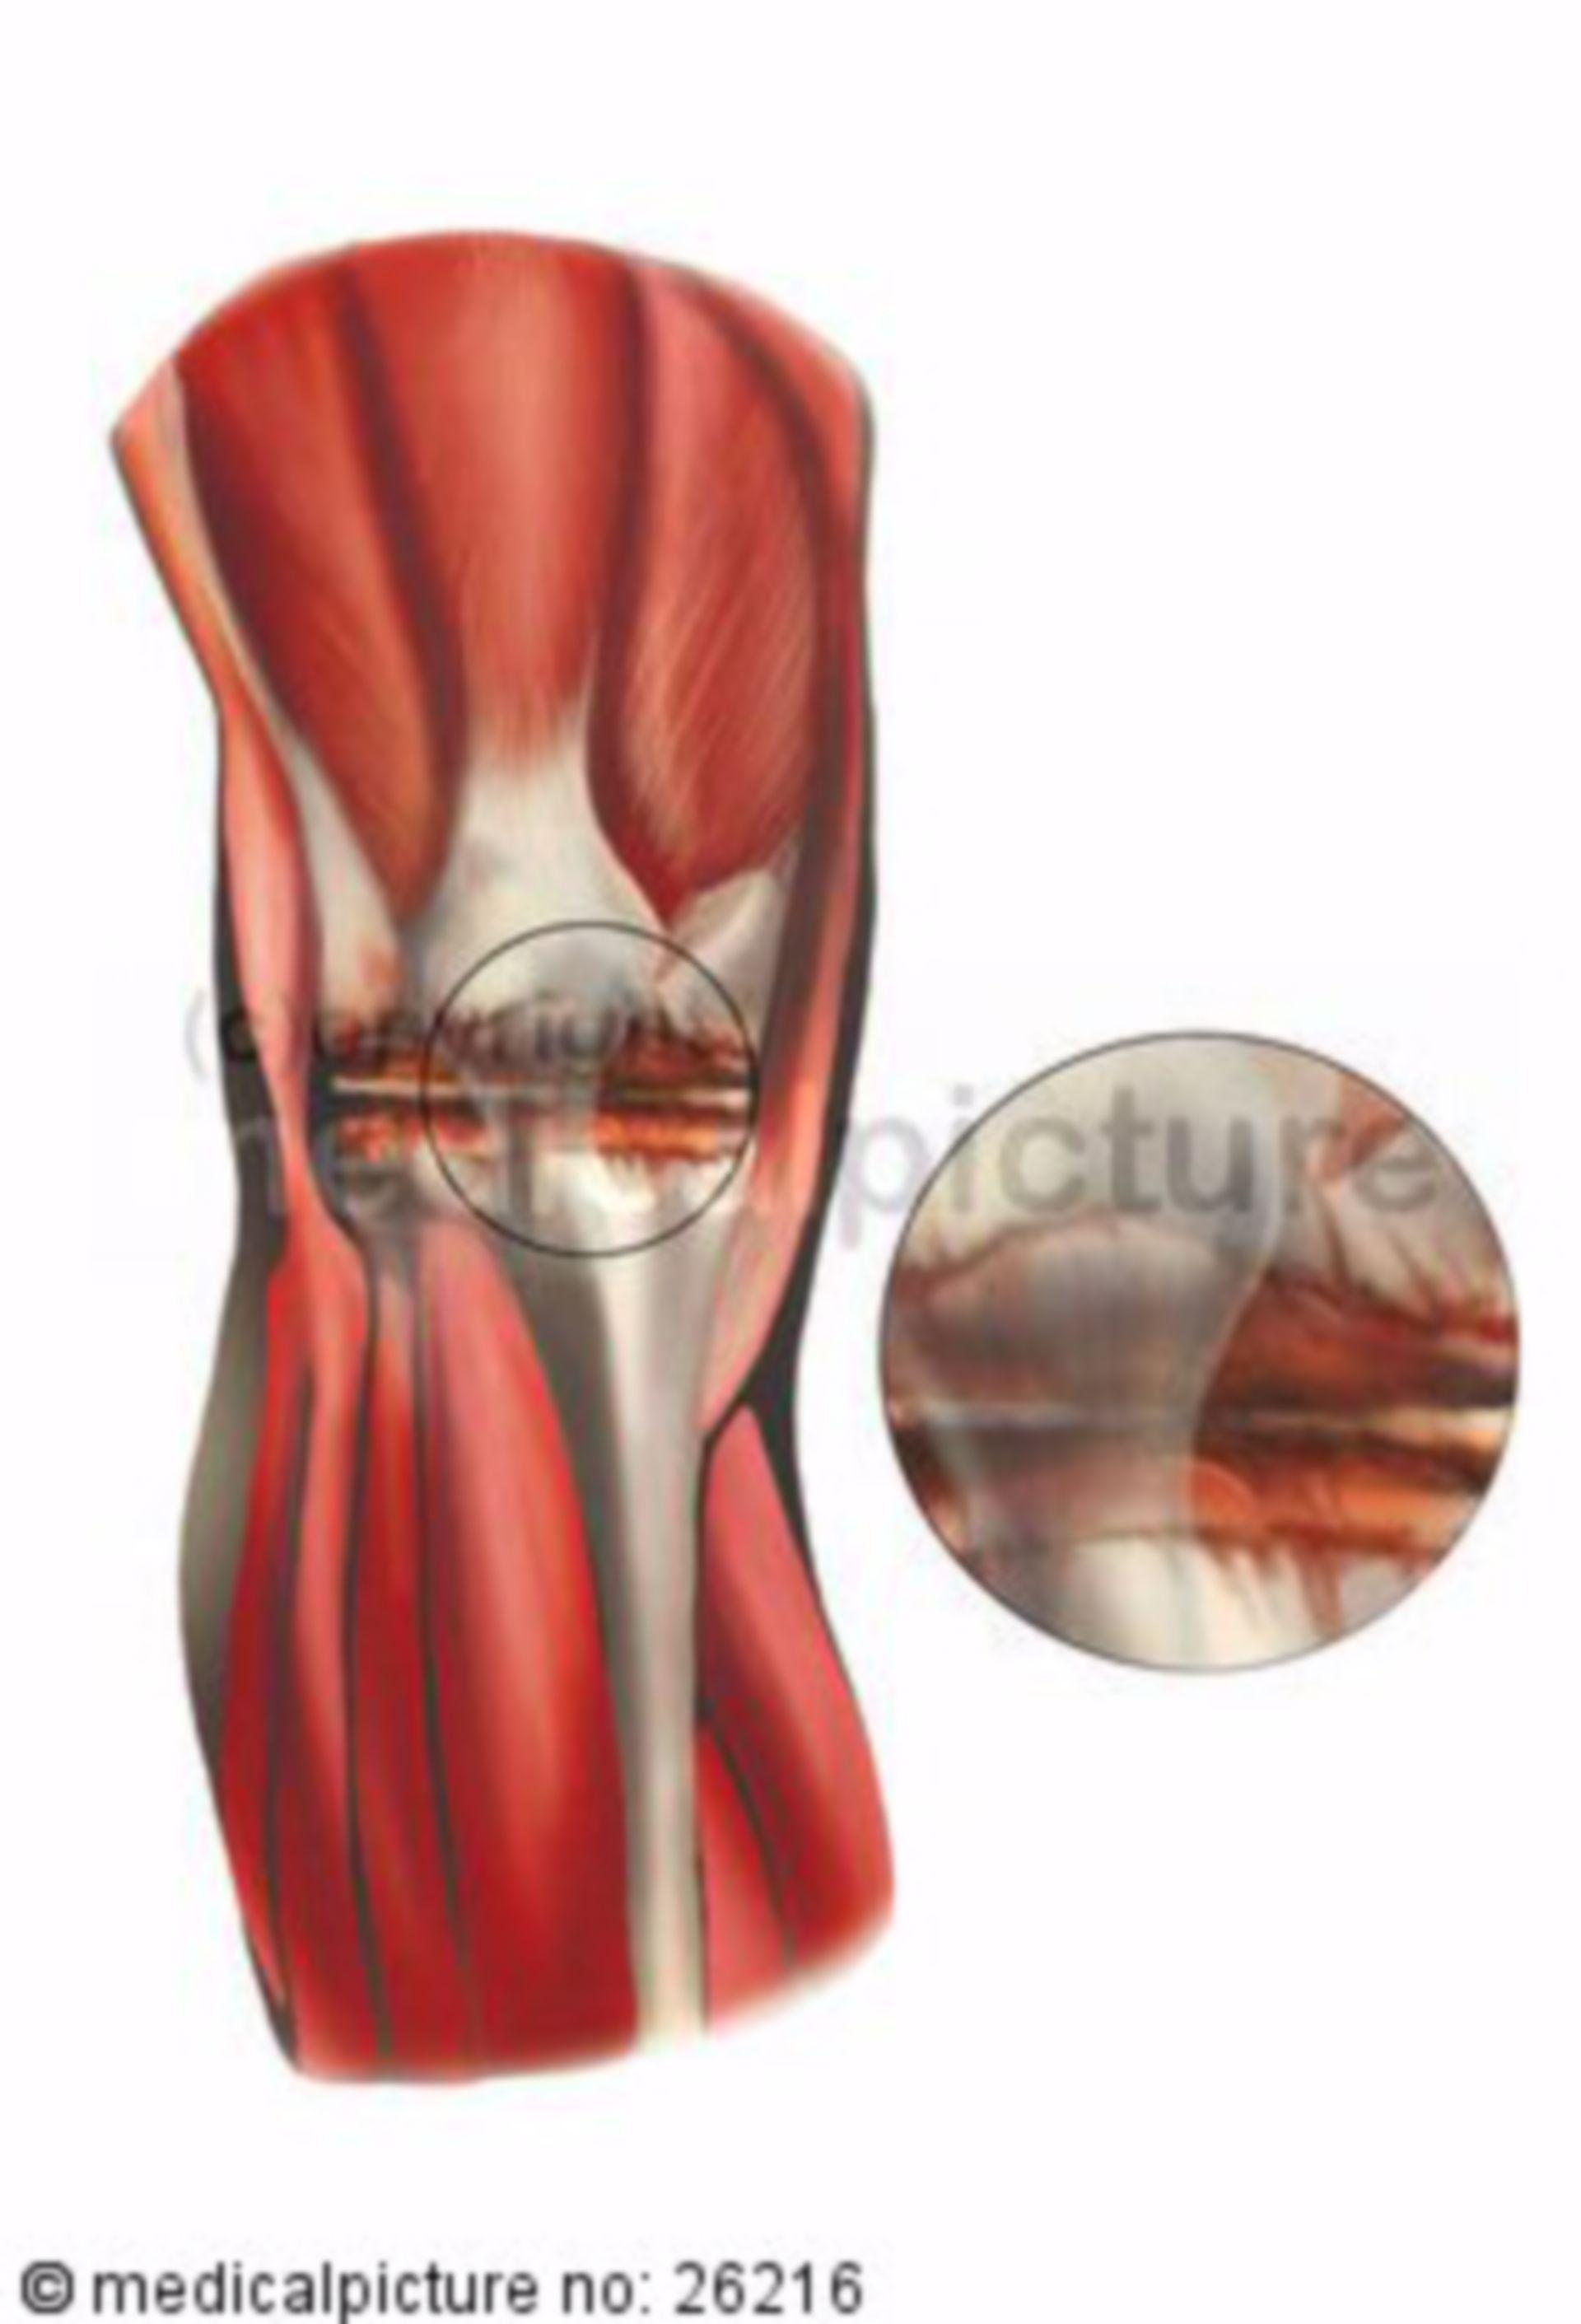 Arthritis im Kniegelenk